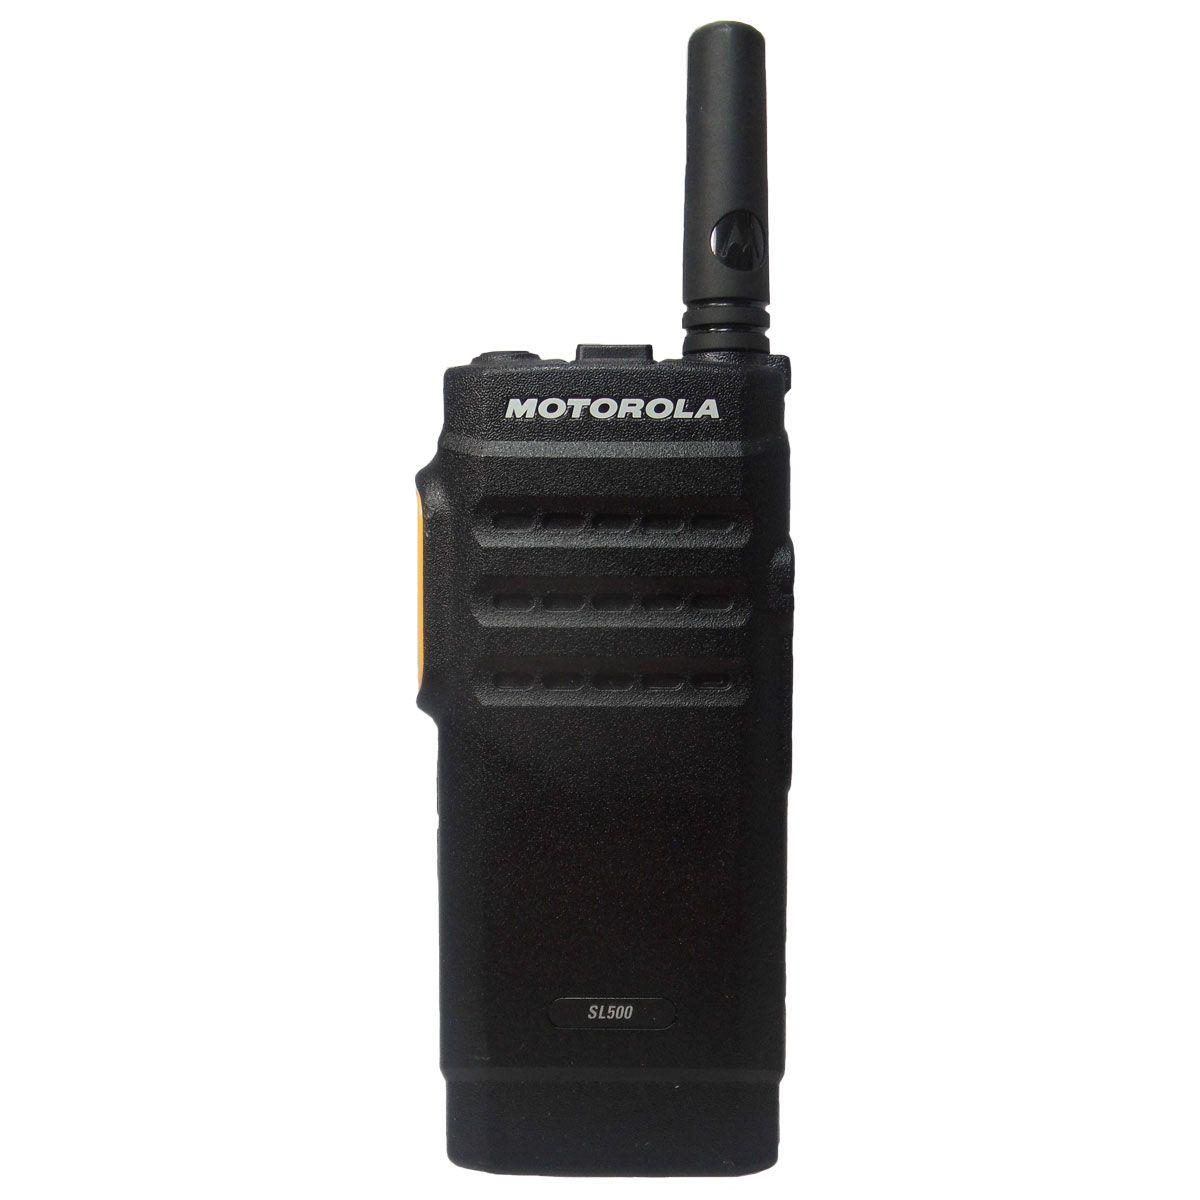 Radio Portátil Motorola SL500 Digital